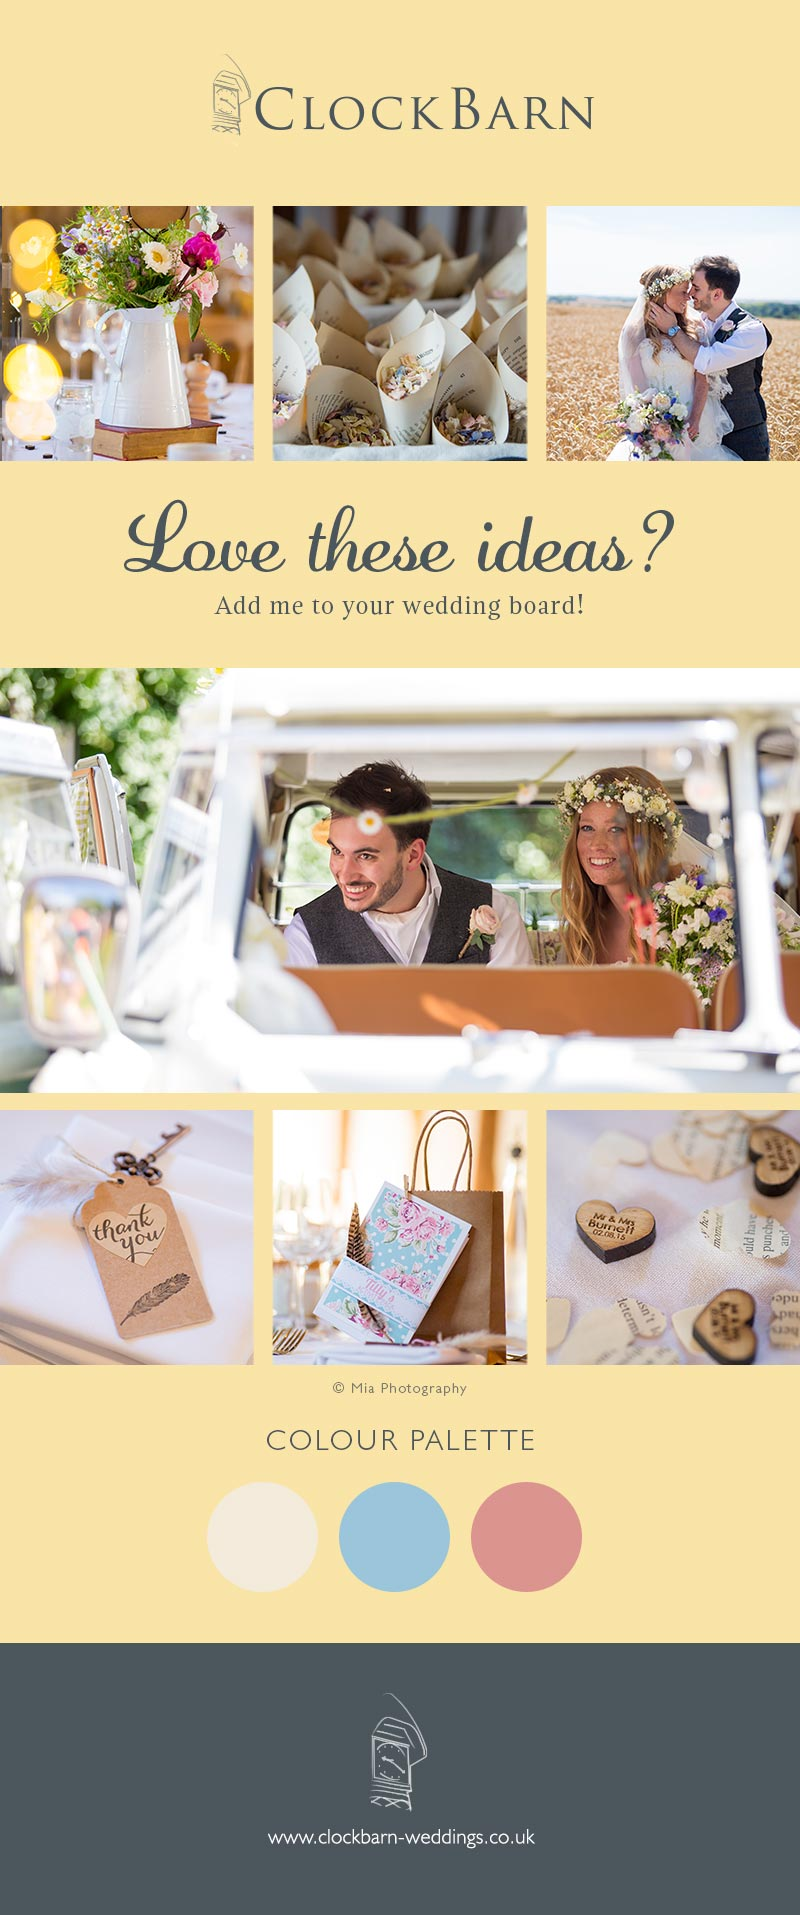 Laura and Mitch Clock Barn wedding